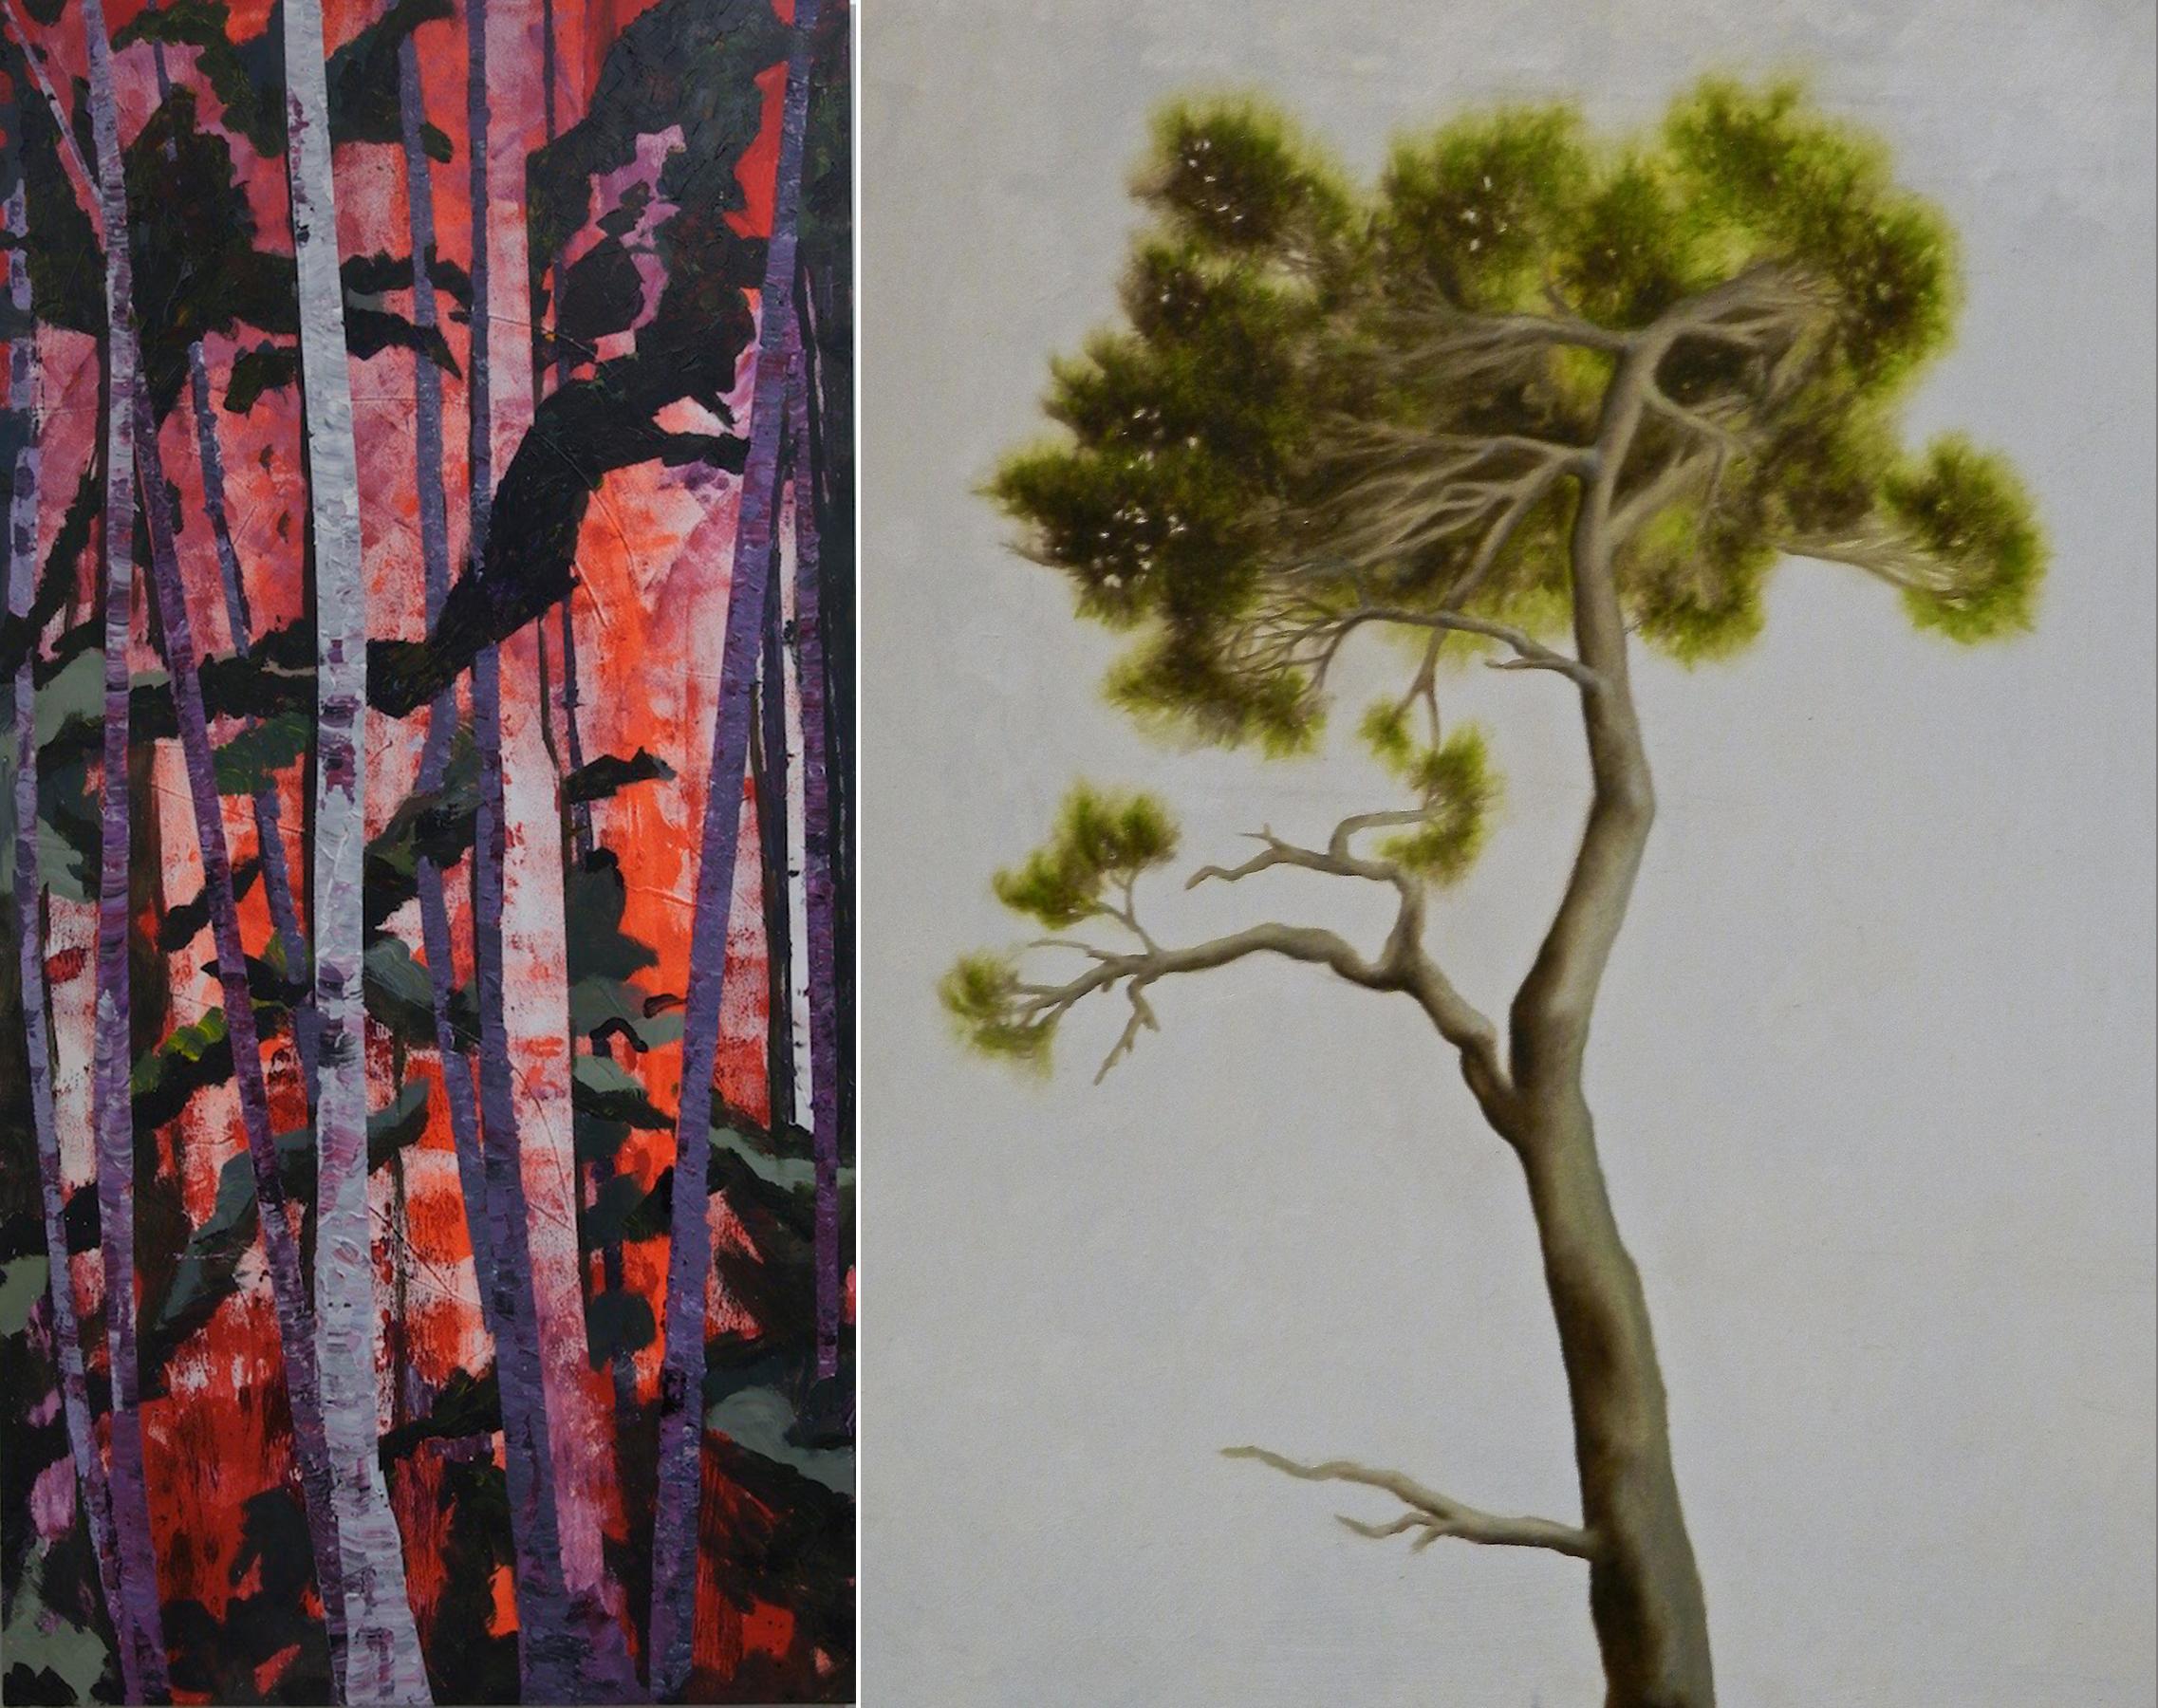 "AUTUMN  by Mary Lynne Atkinson 72"" x 36"" acrylic on birchwood (left) •  WHITE PINE STUDY  by Pauline Bradshaw 14"" x 12""oil on masonite( right)"